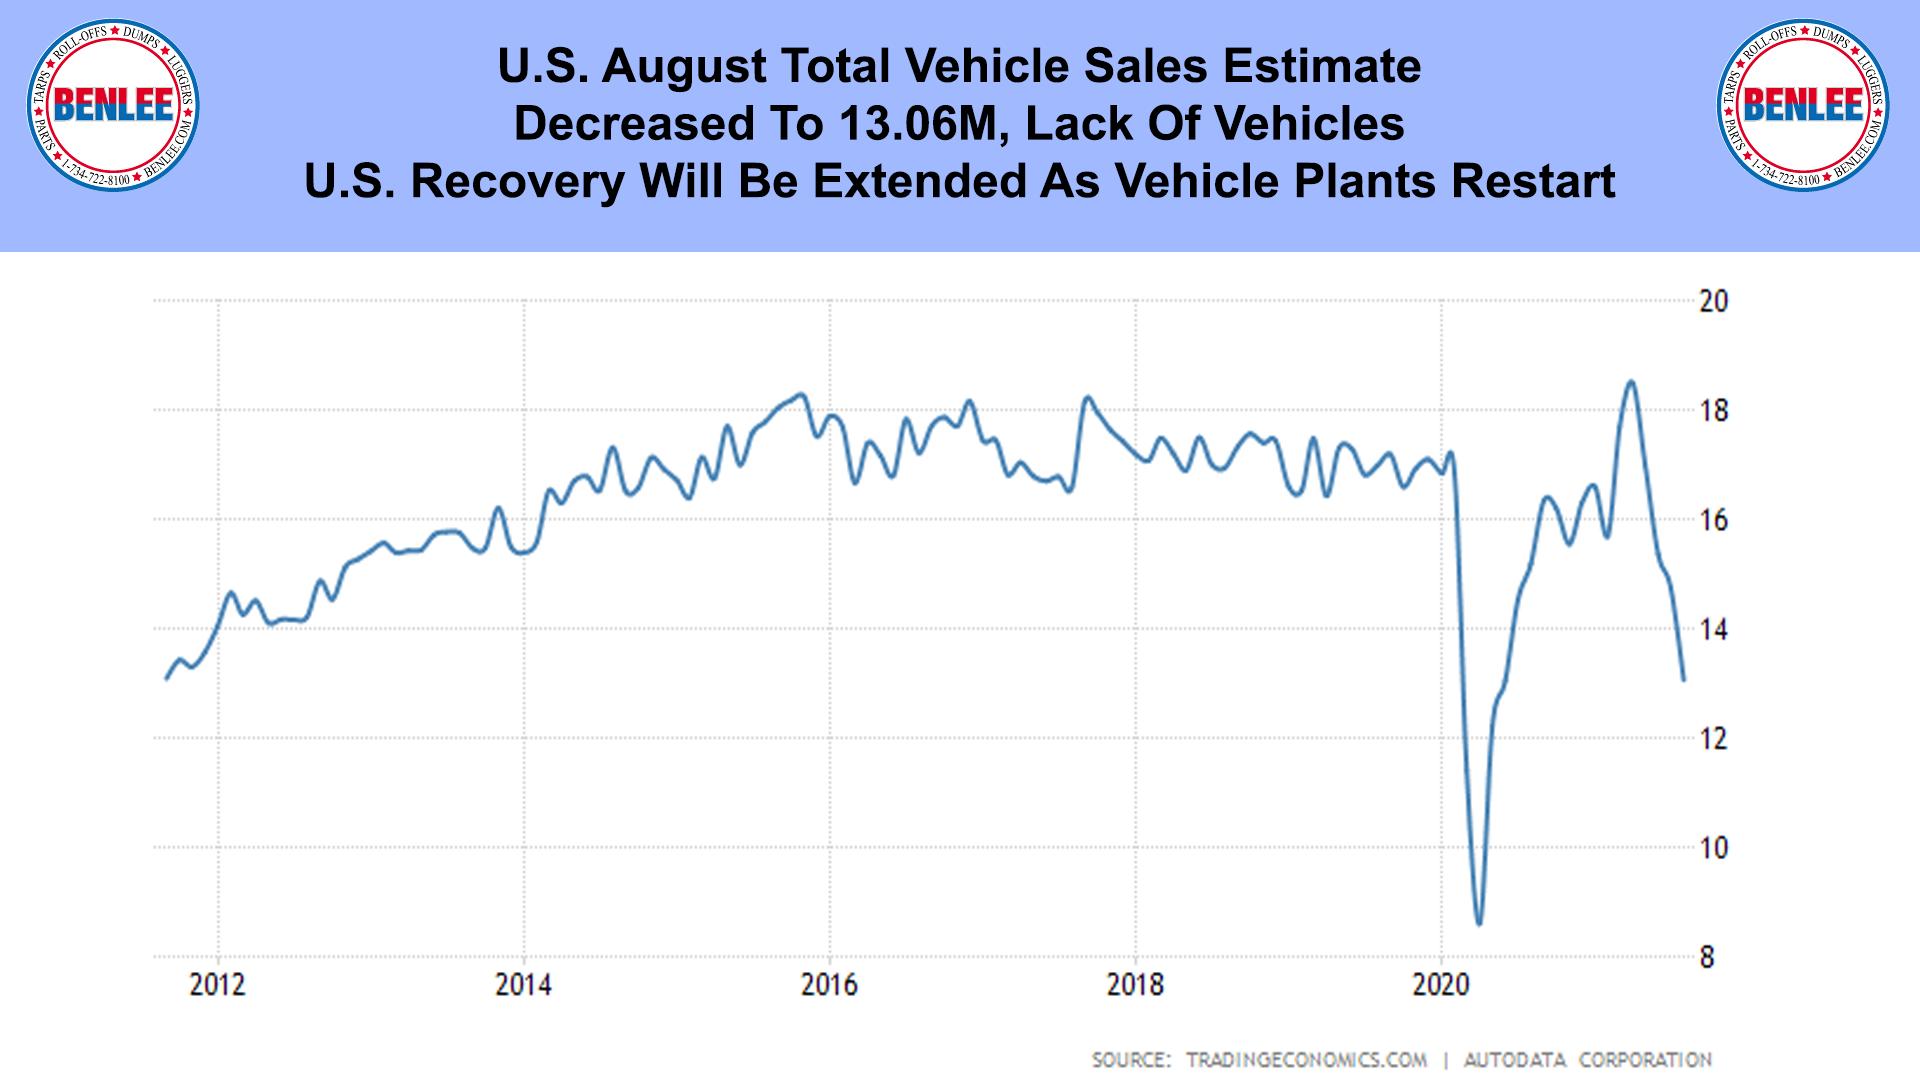 U.S. August Total Vehicle Sales Estimate